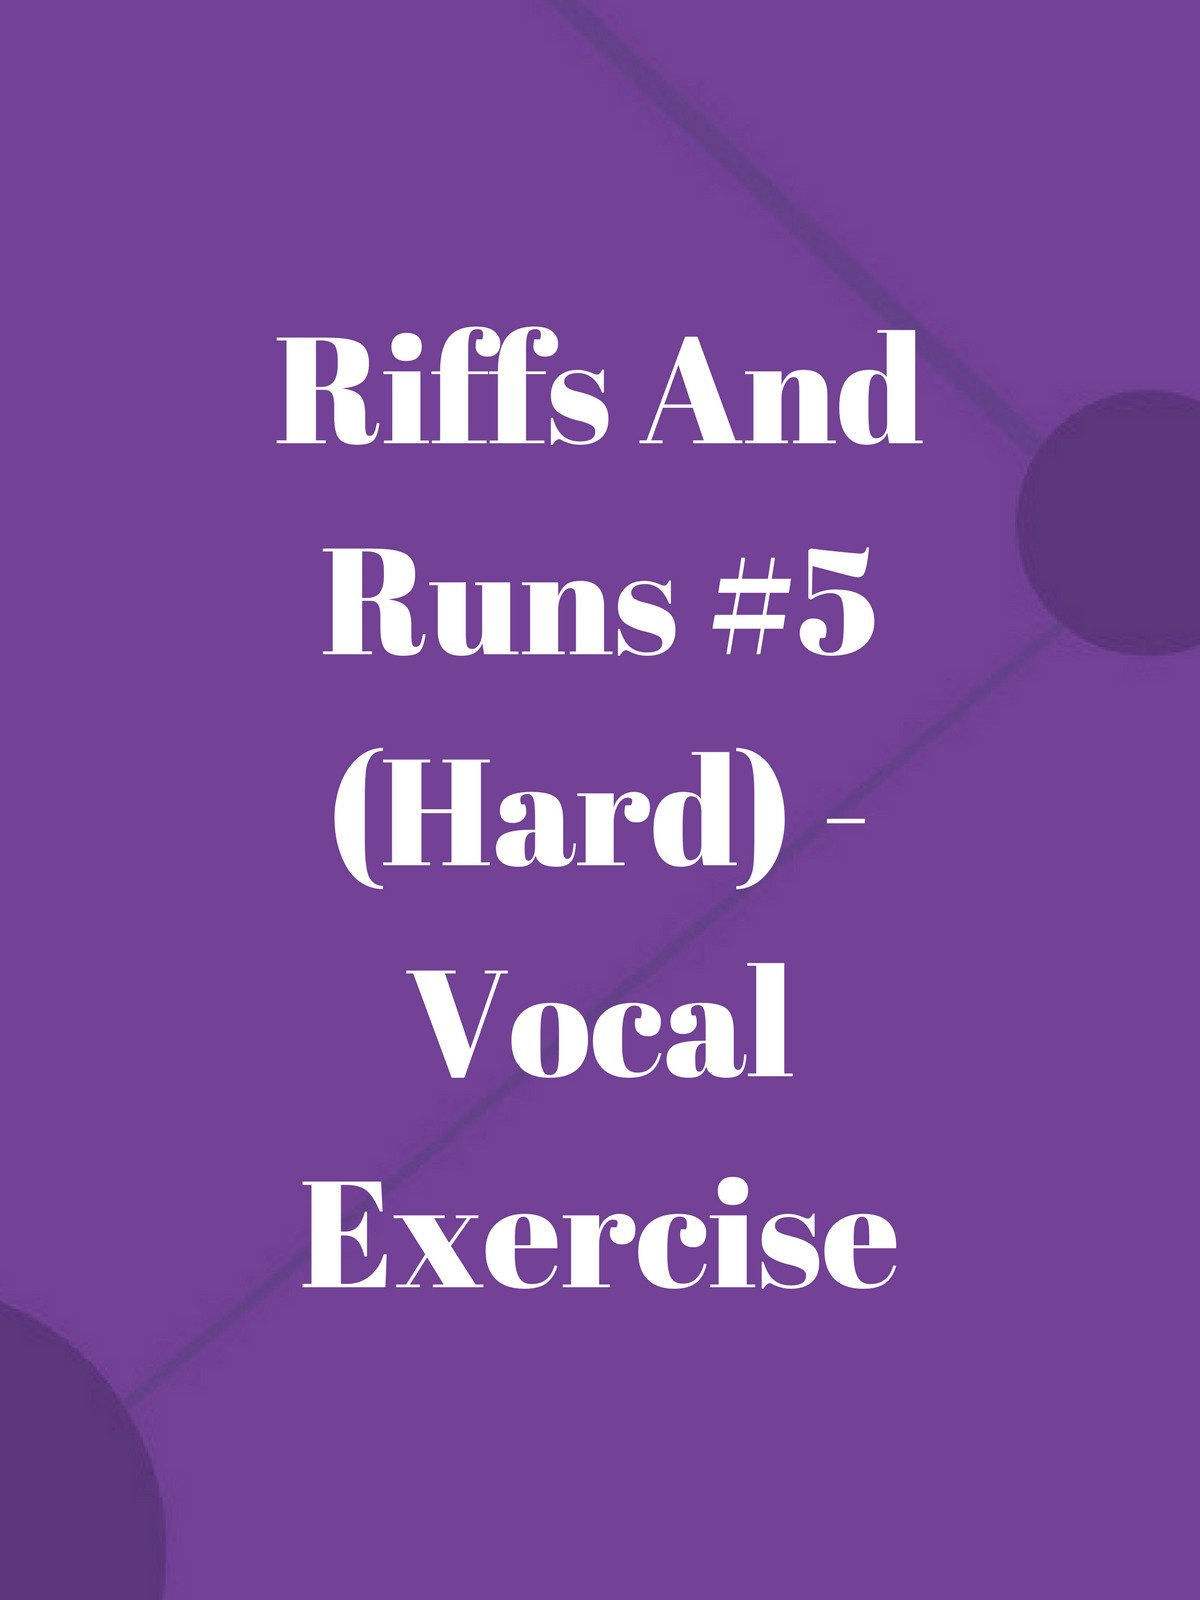 Riffs And Runs #5 (Hard)